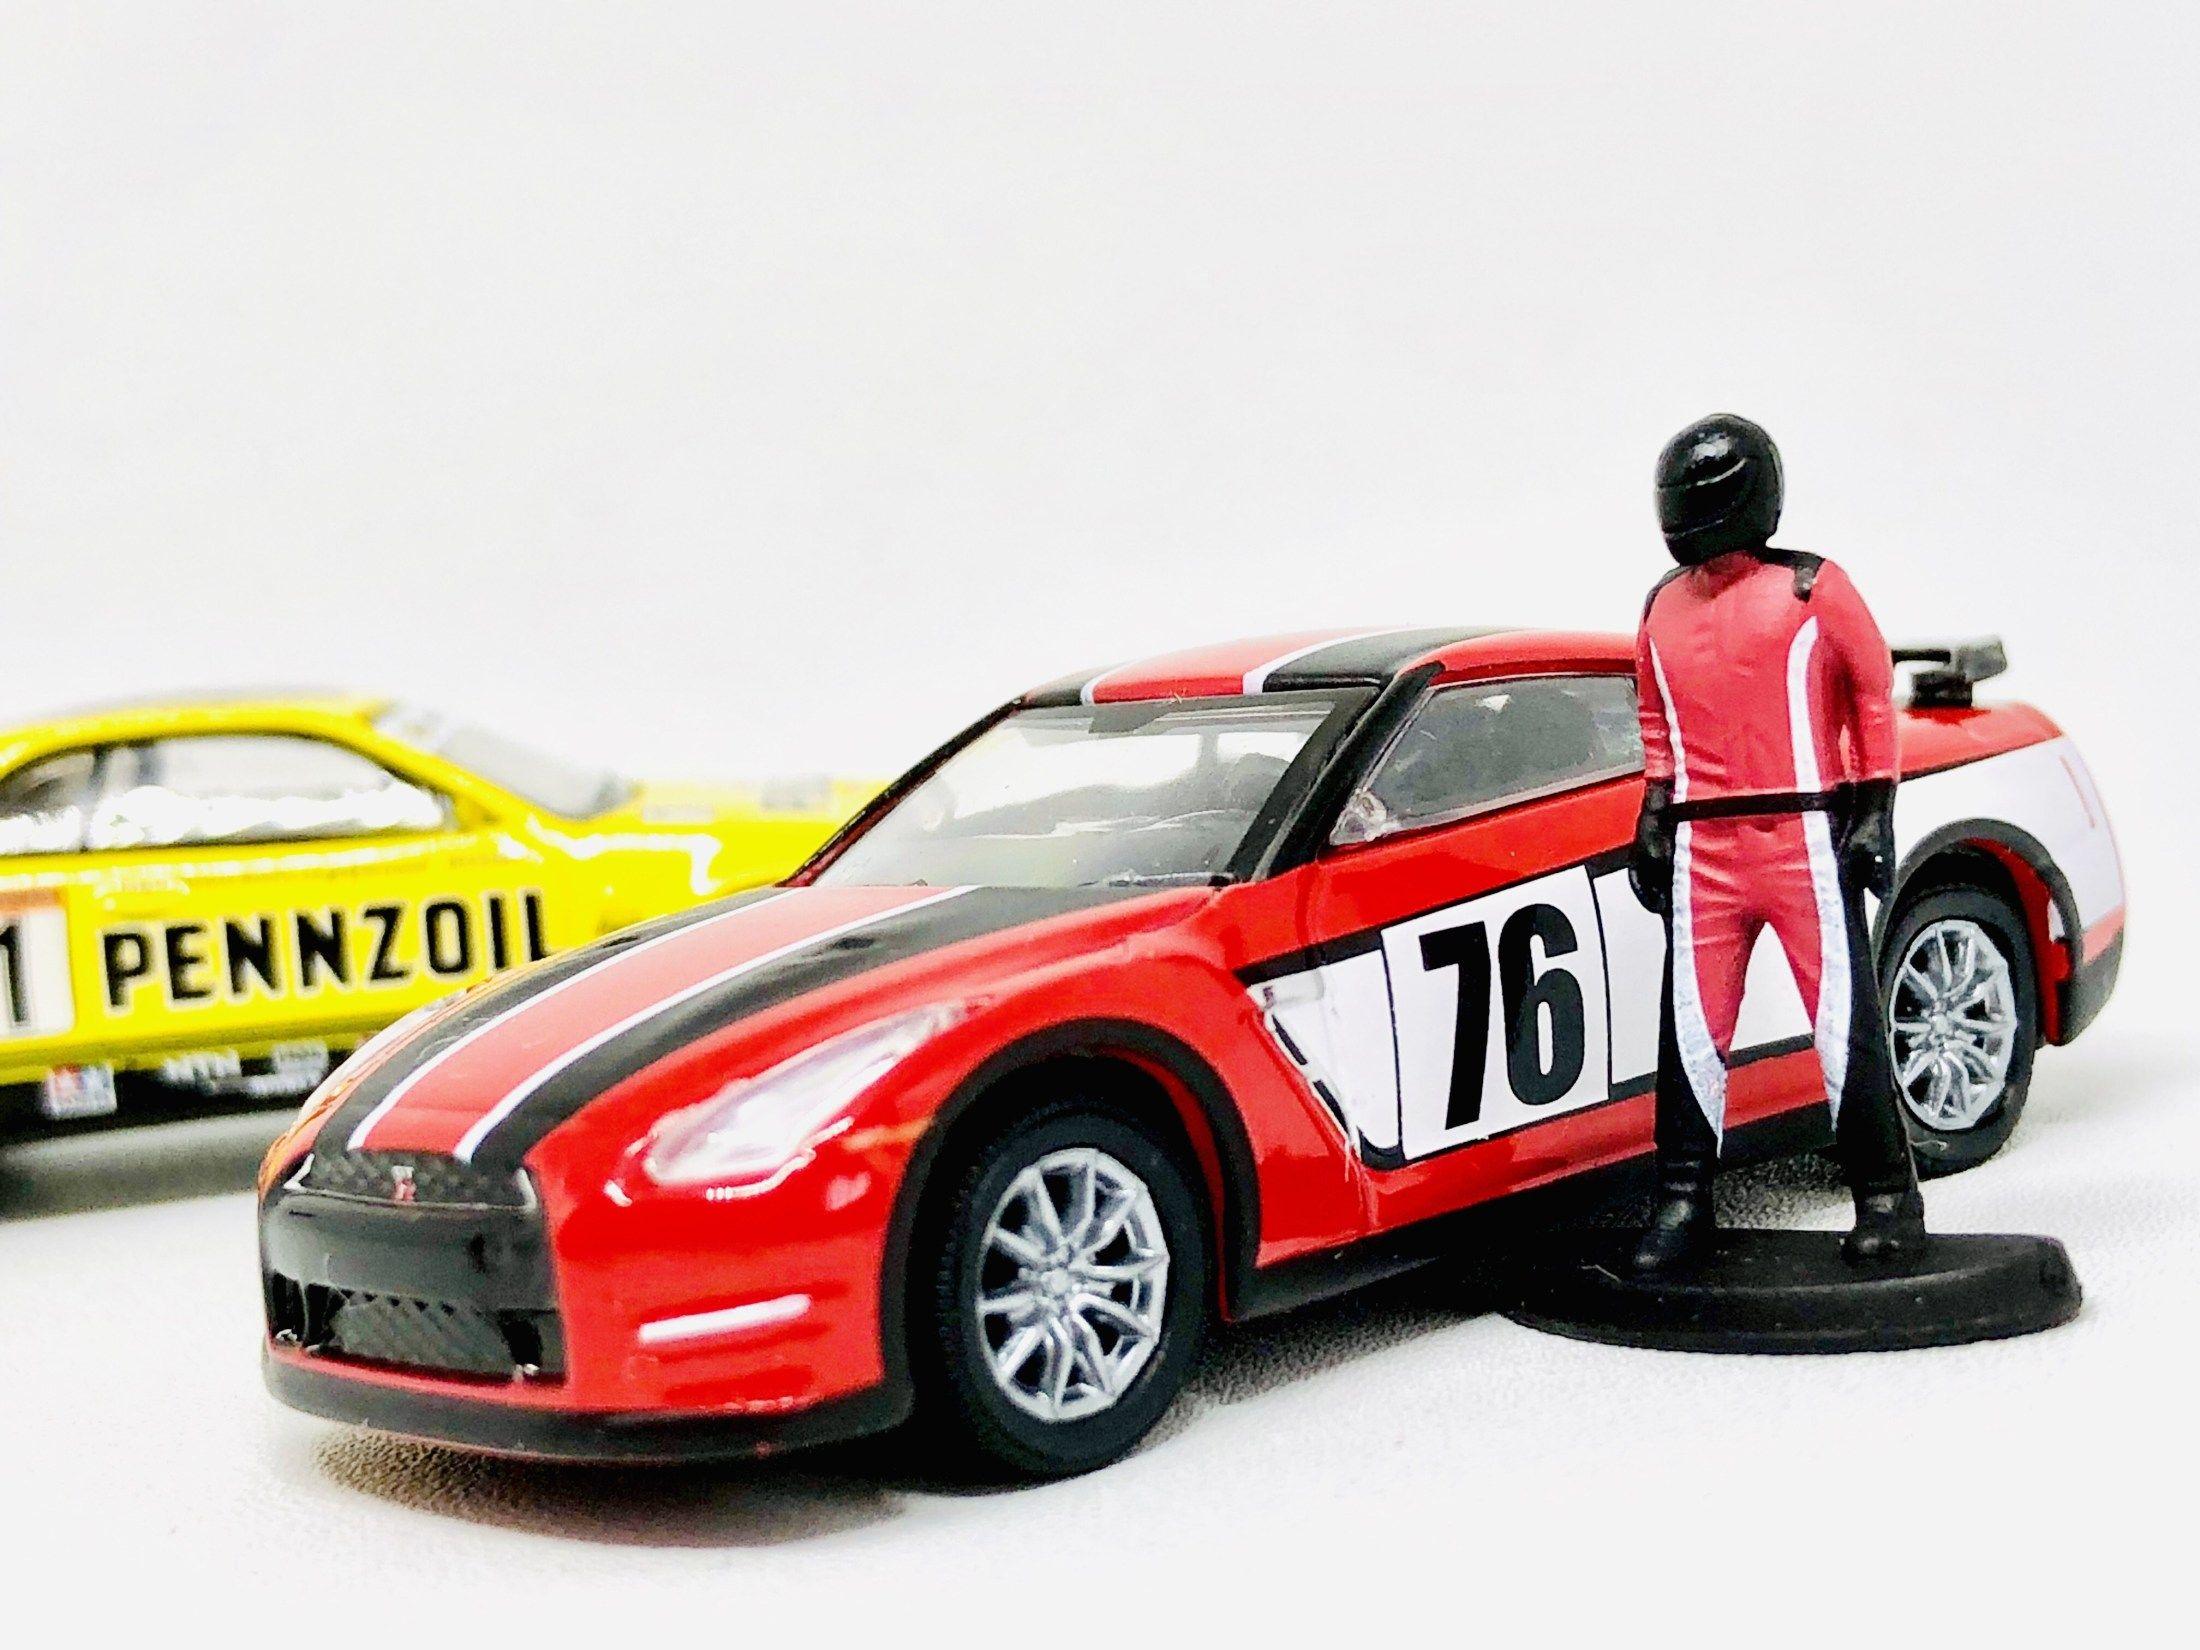 Greenlight Indonesia Skyline Pennzoil Vs Hobby Shop Diecastgraphy Hot Wheels Nissan Skyline Mobil Balap